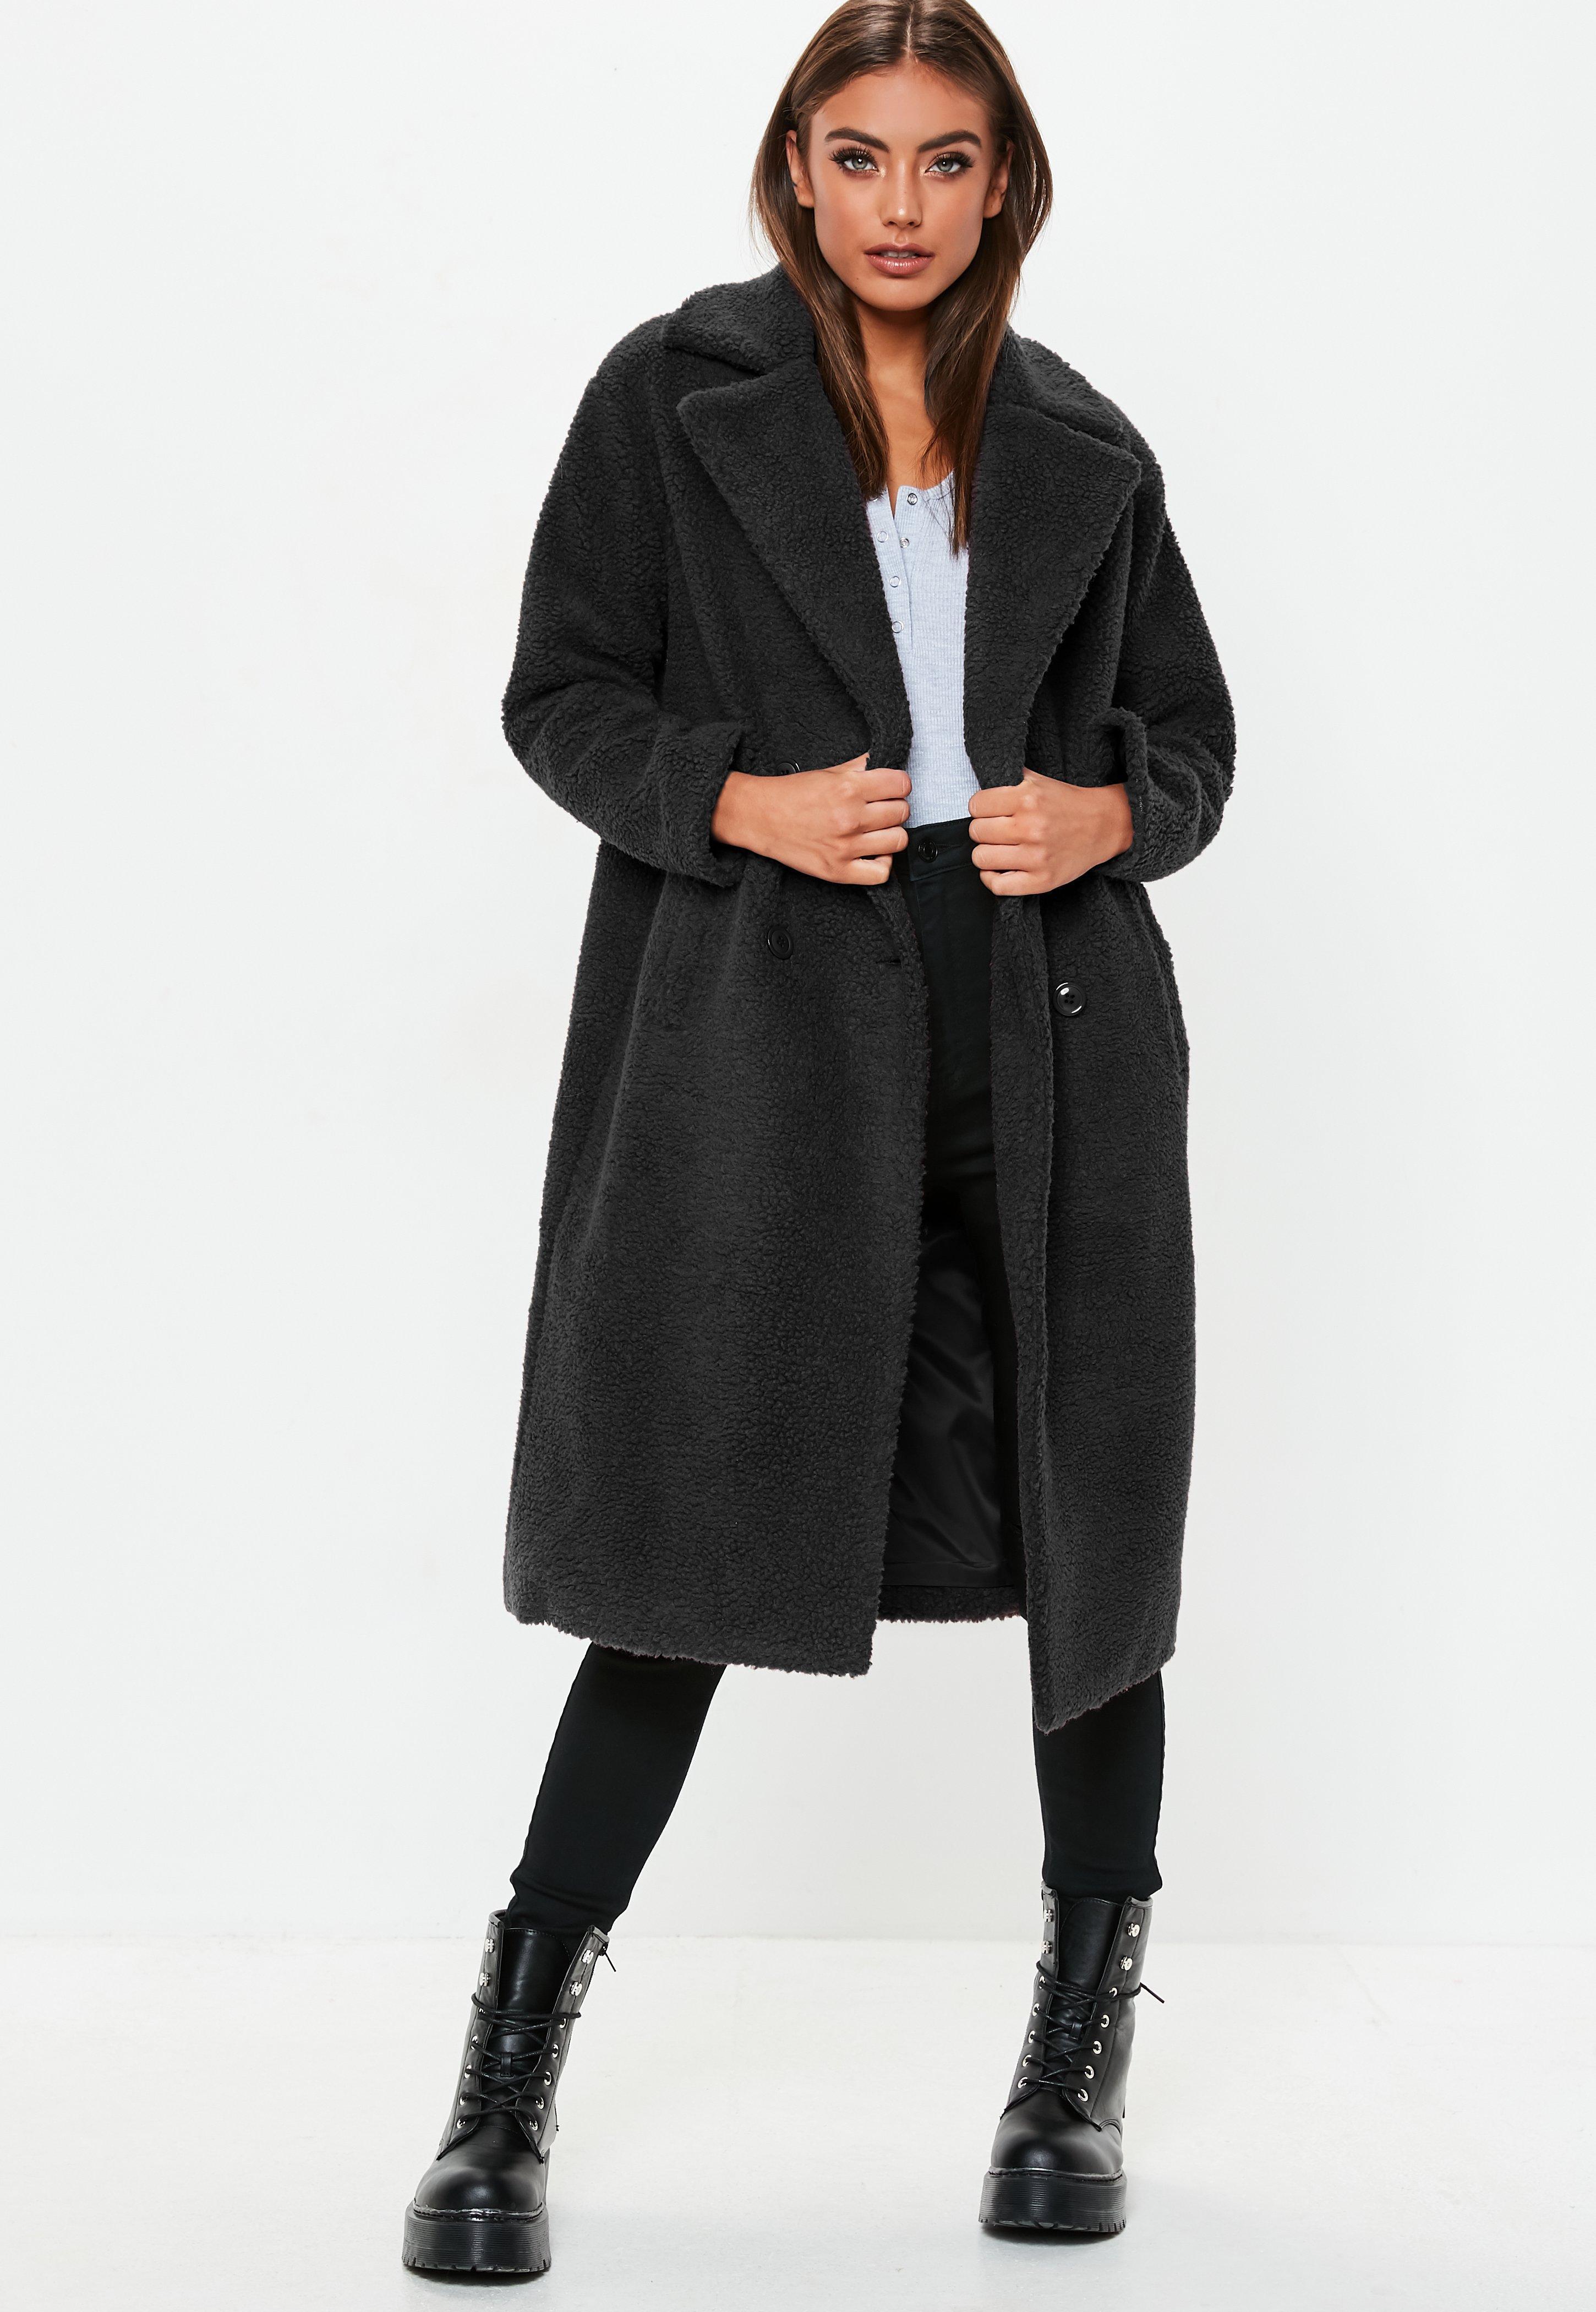 a11f43530 Lyst - Missguided Tall Black Longline Borg Teddy Coat in Black